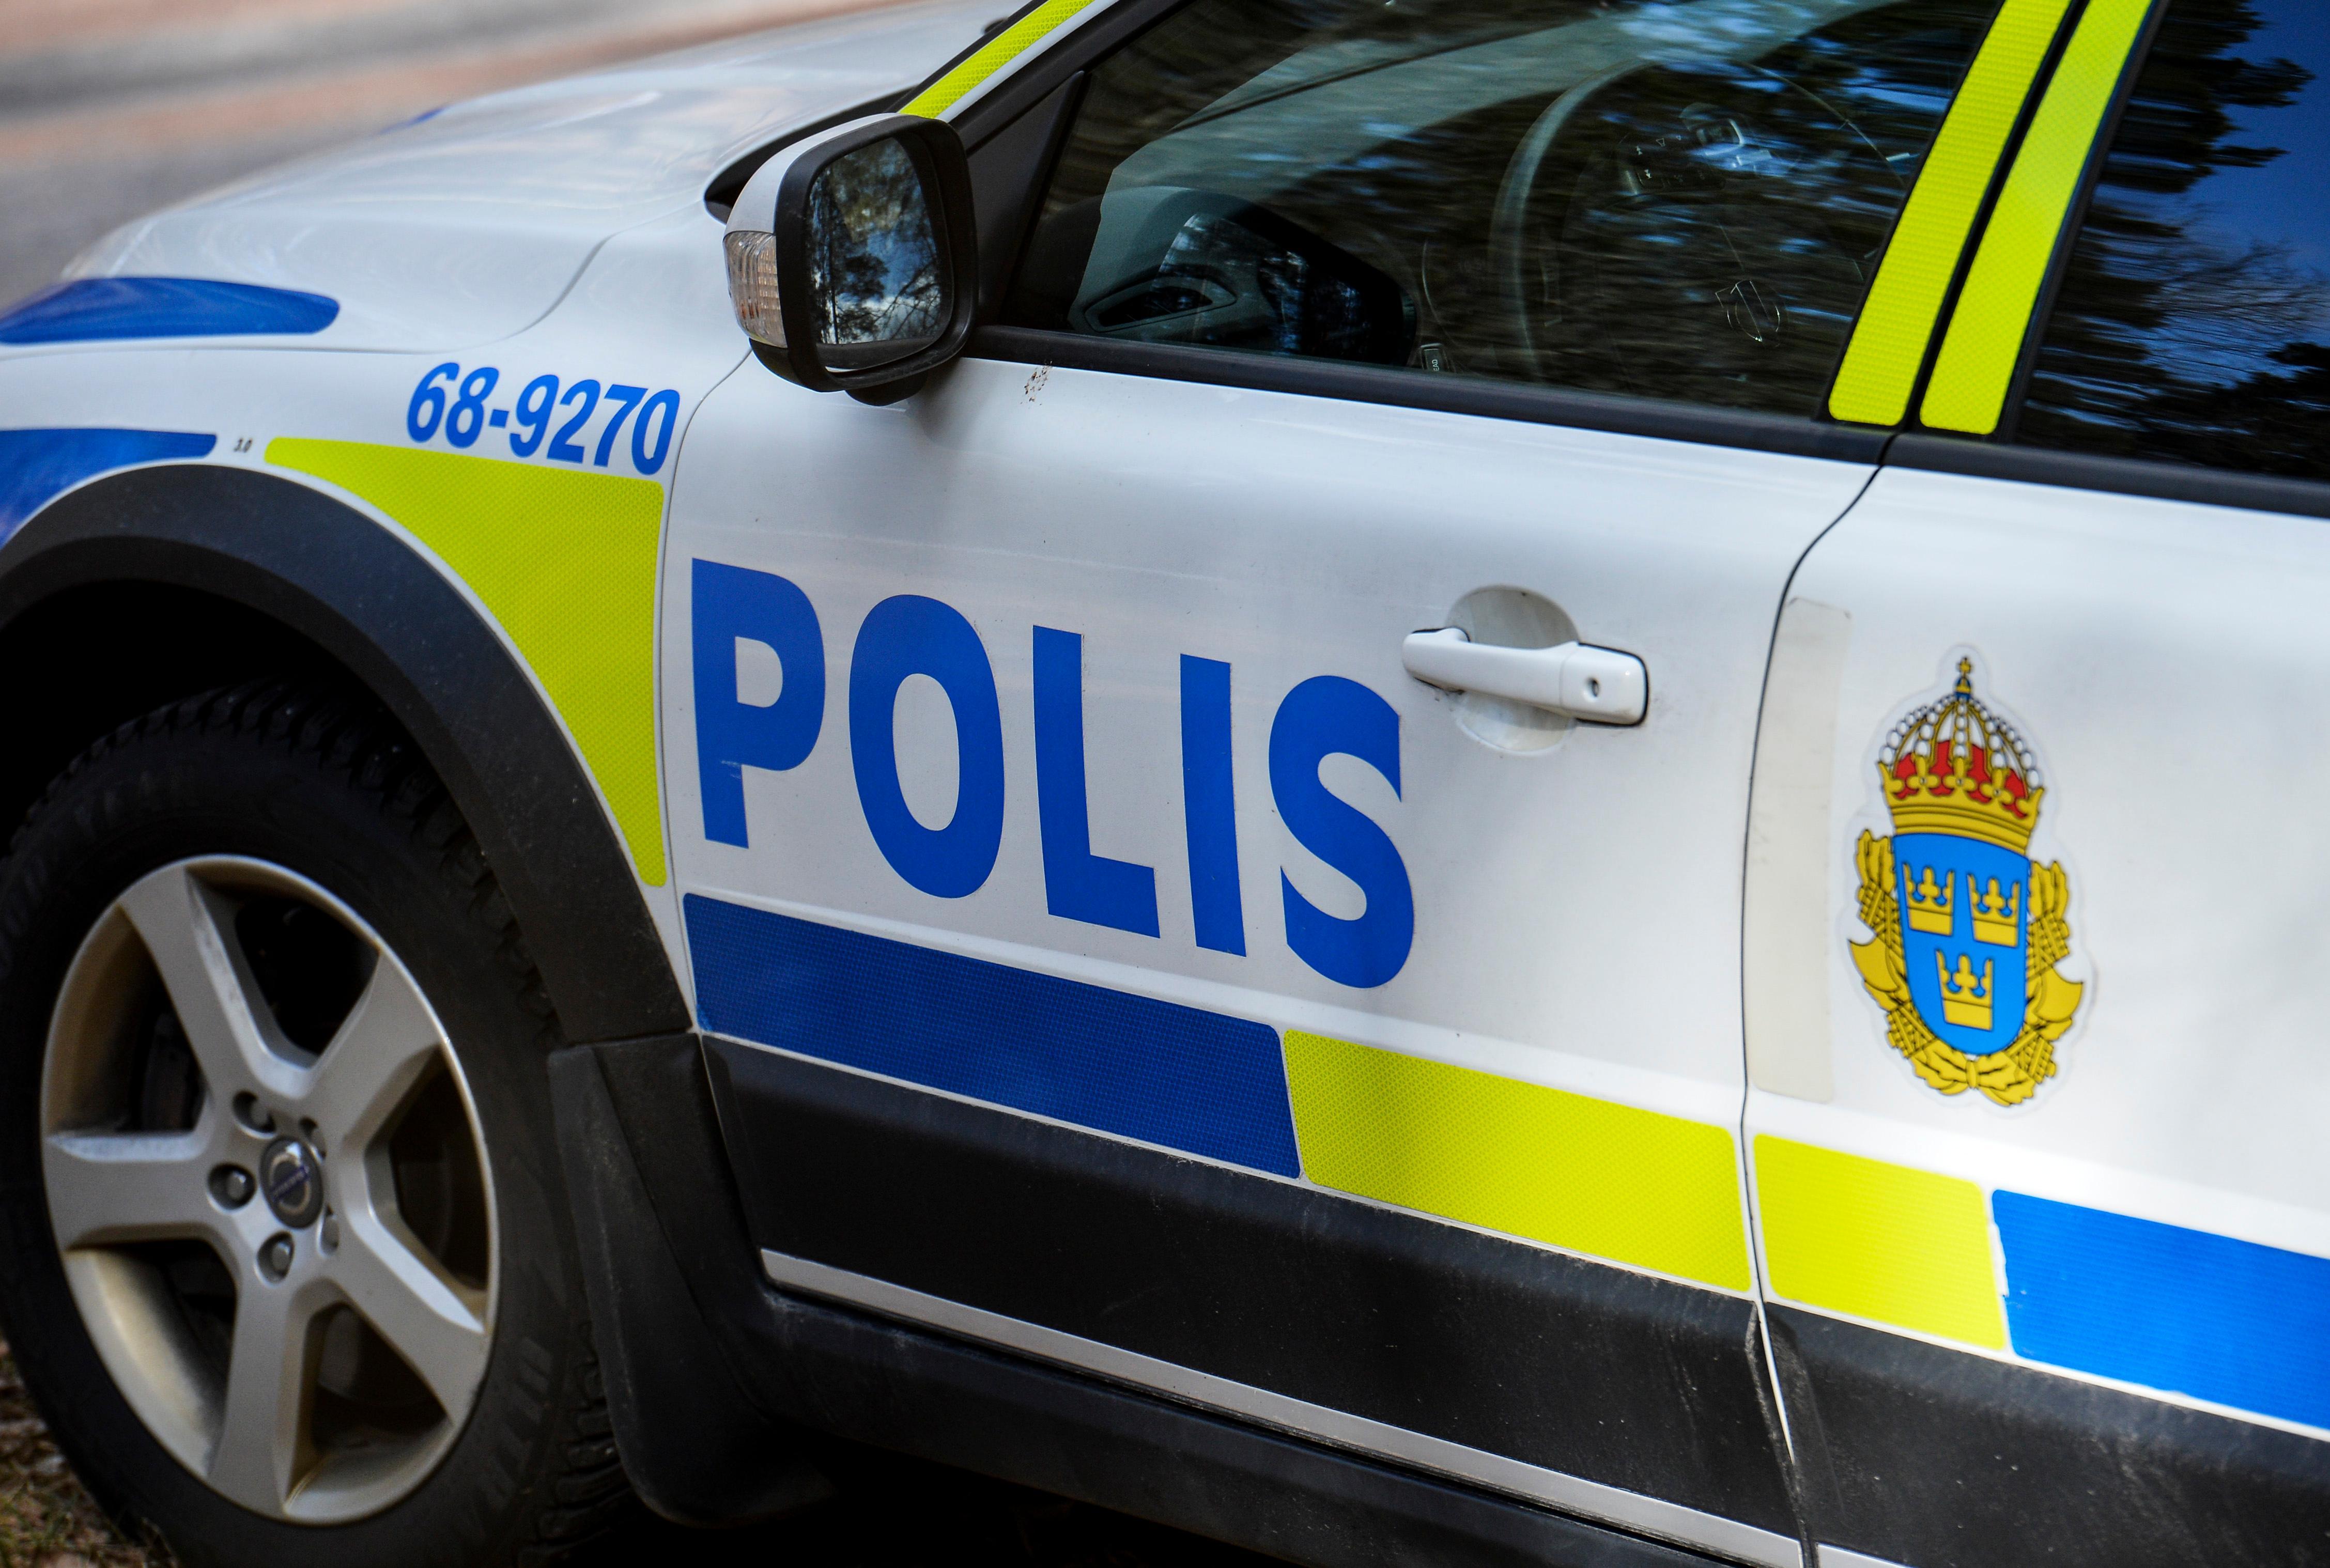 Polis atalas for tros snatteri